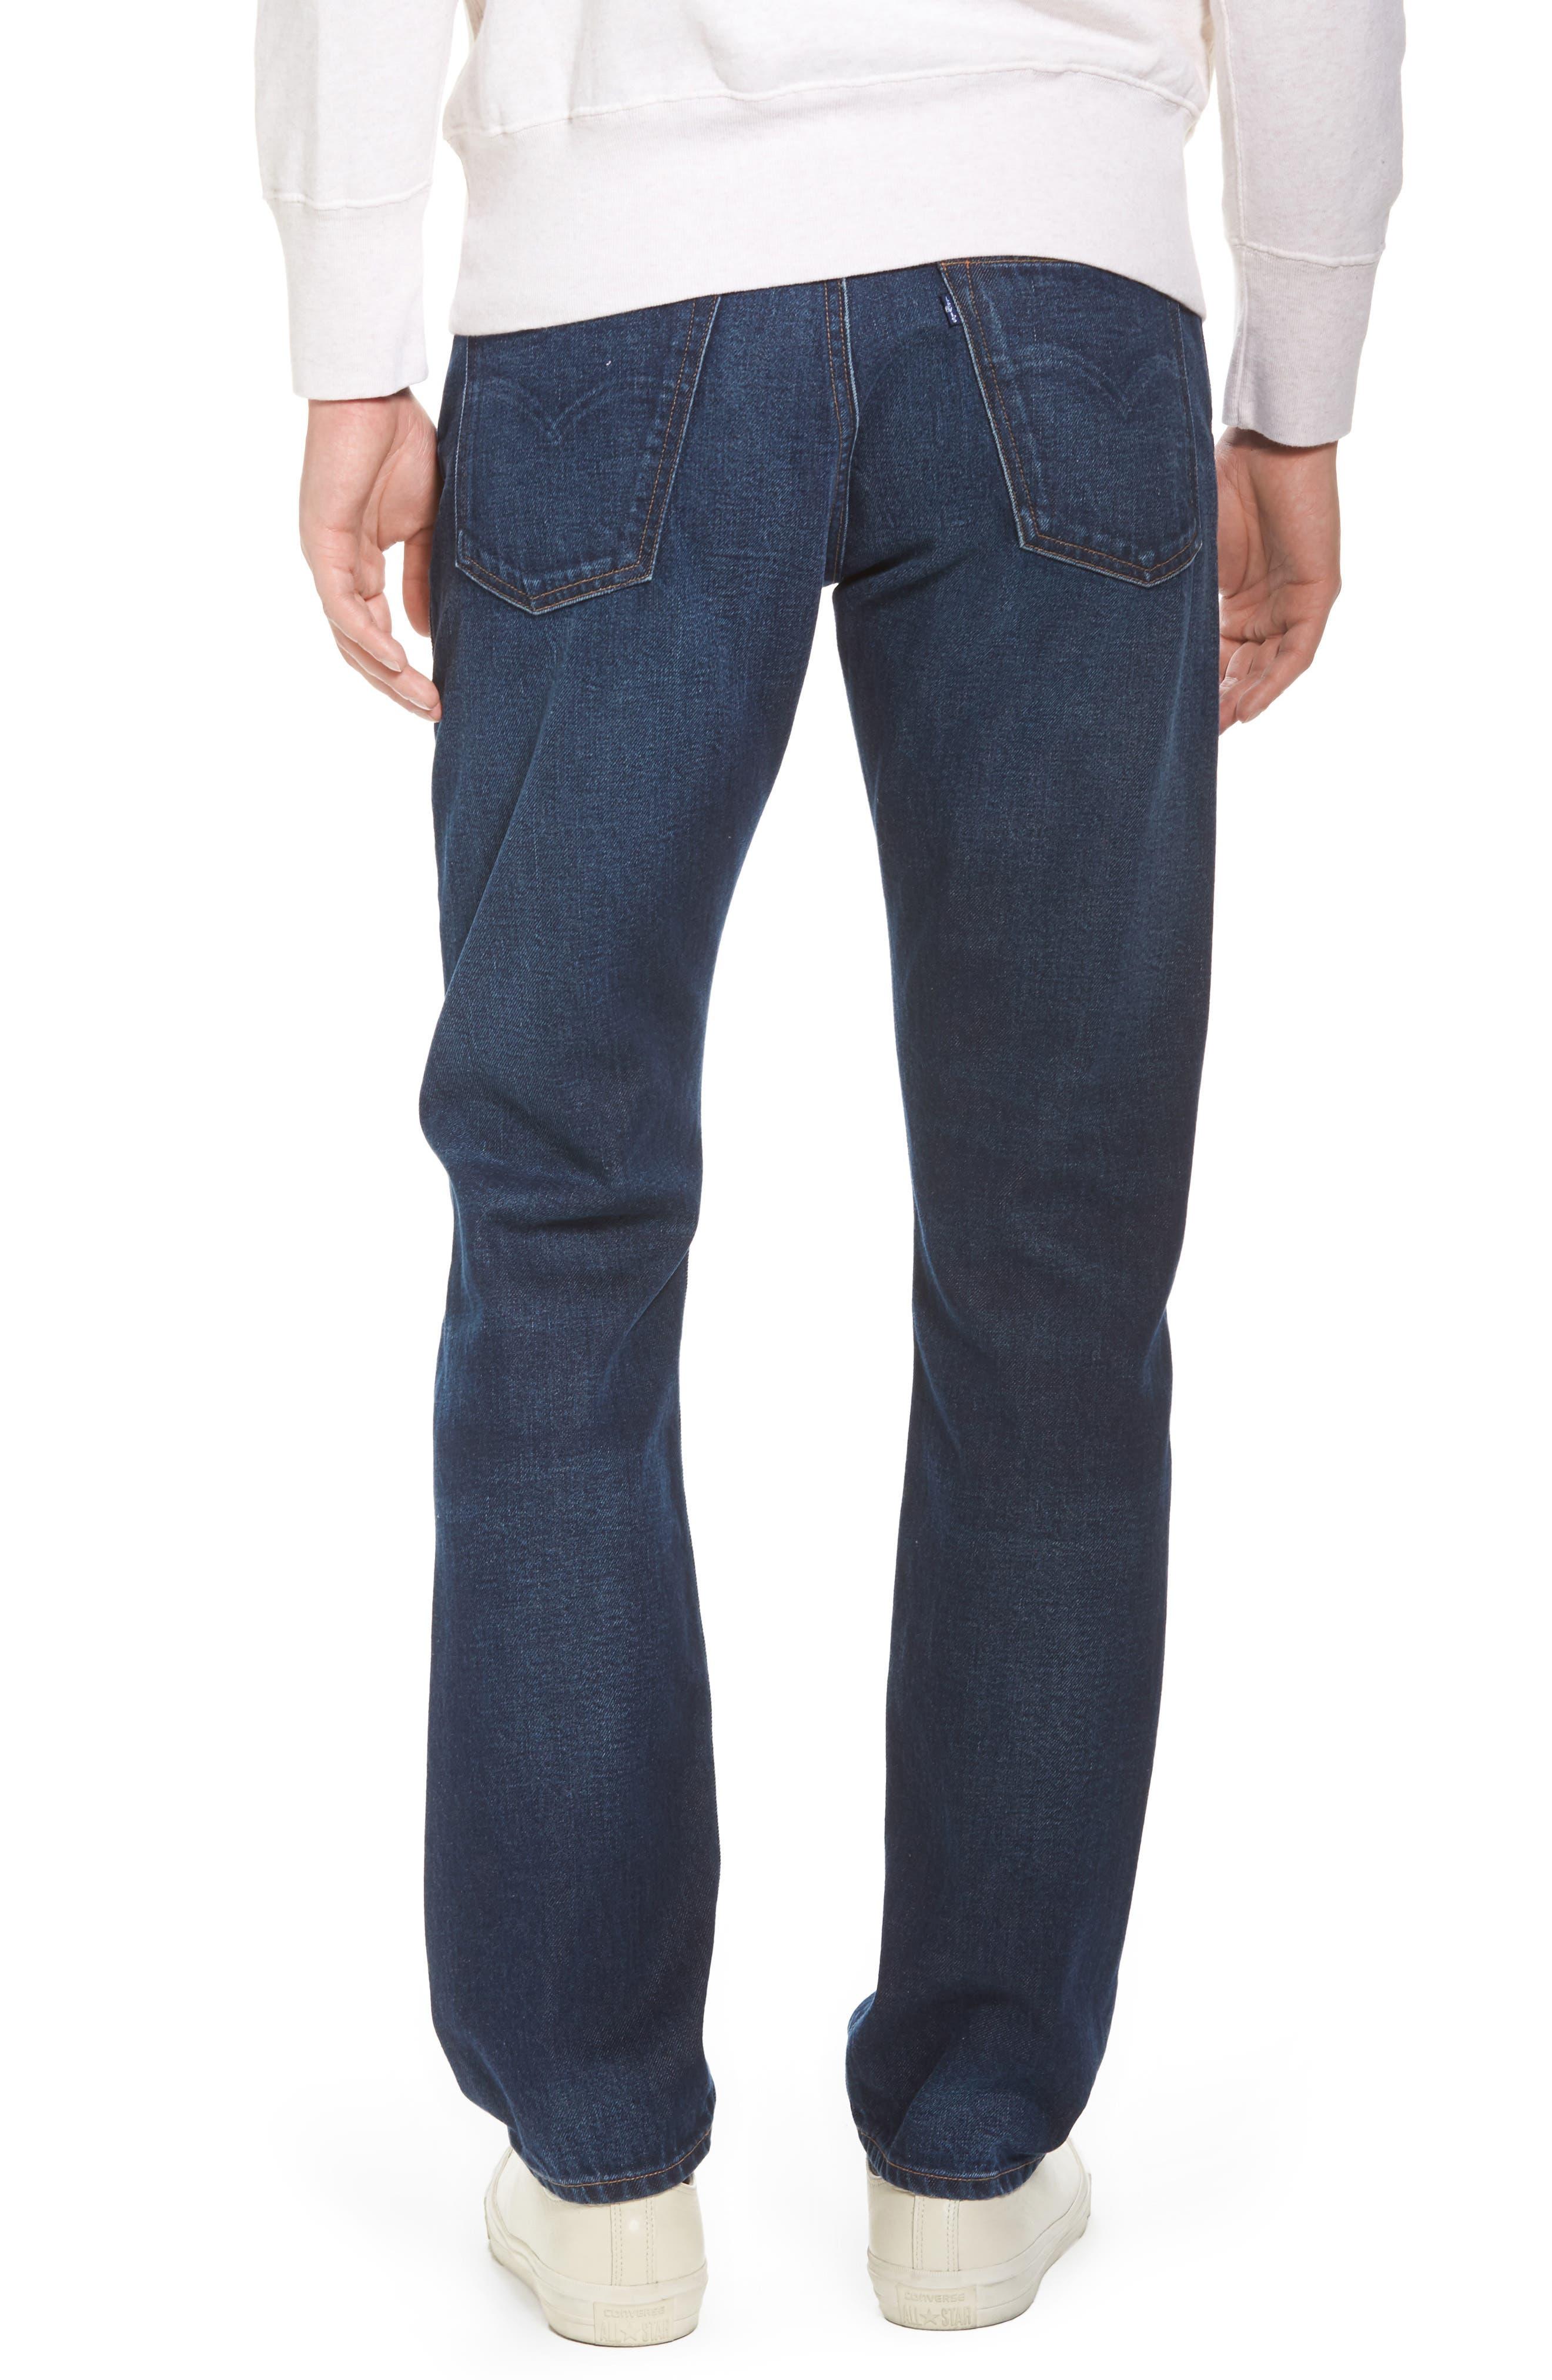 Tack Slim Fit Jeans,                             Alternate thumbnail 2, color,                             401